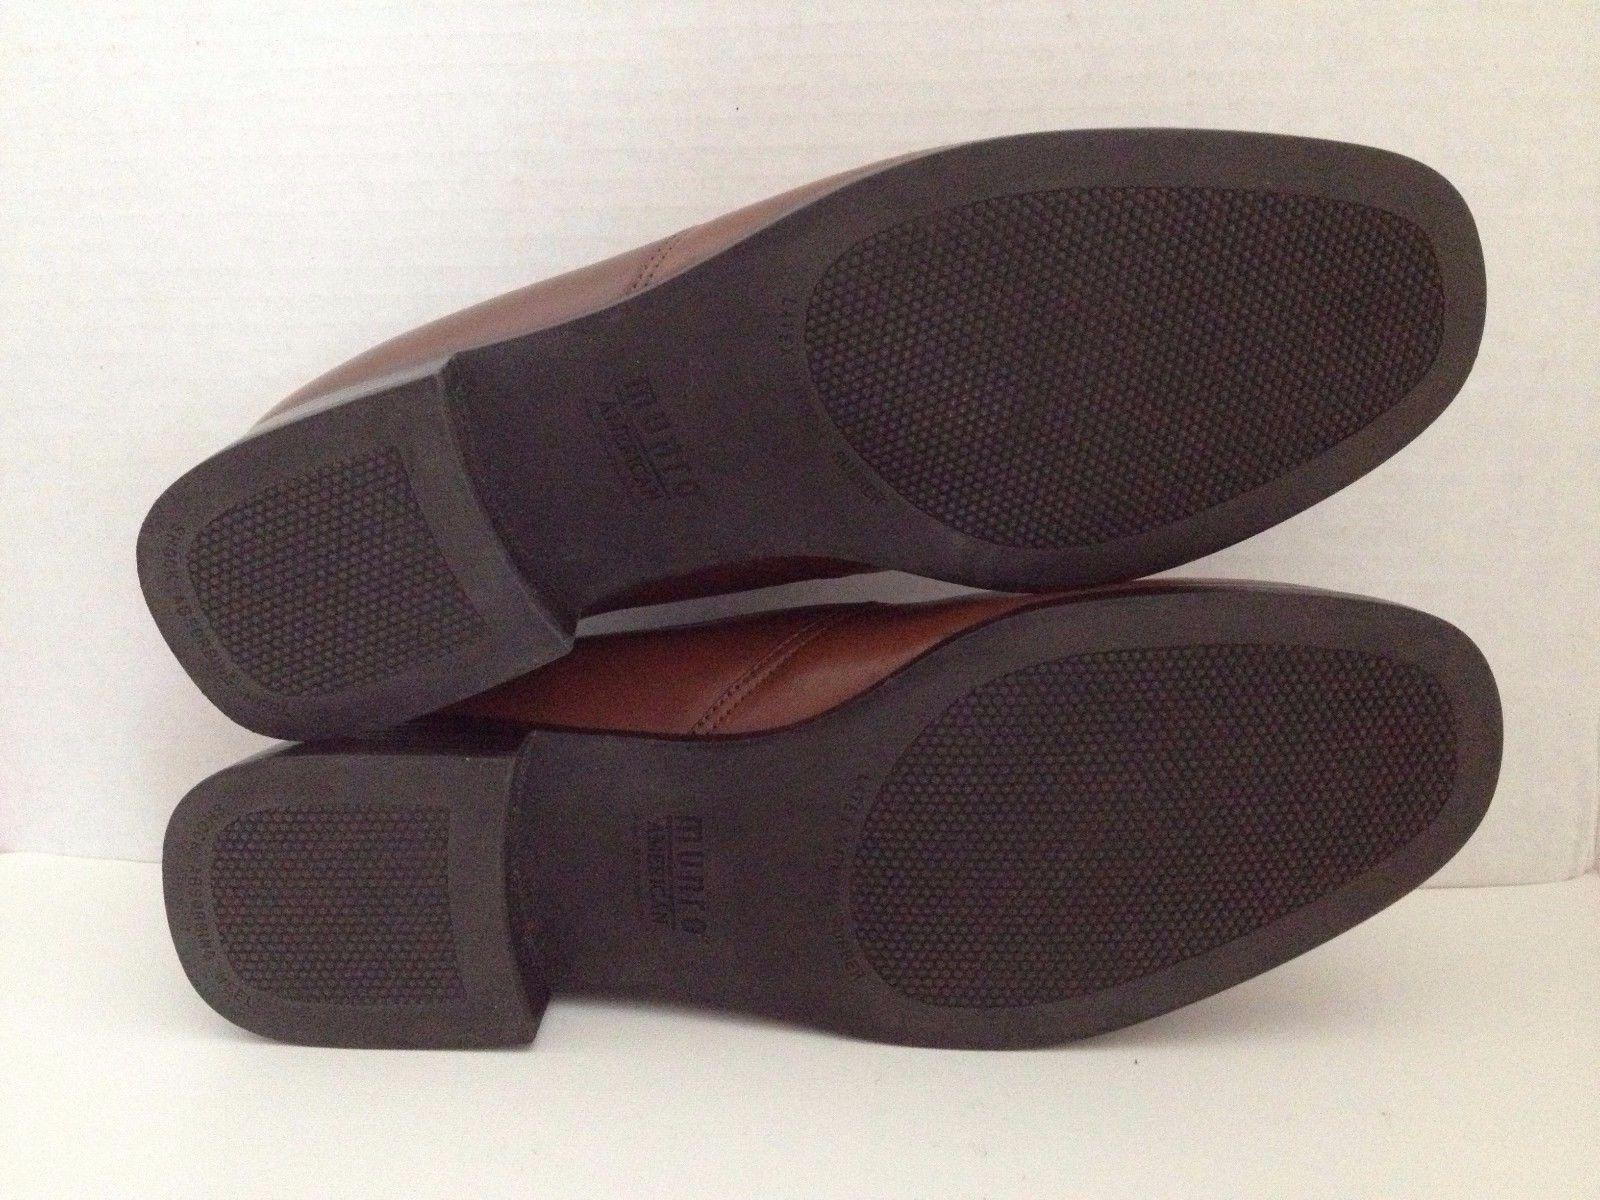 munro shoes promo code